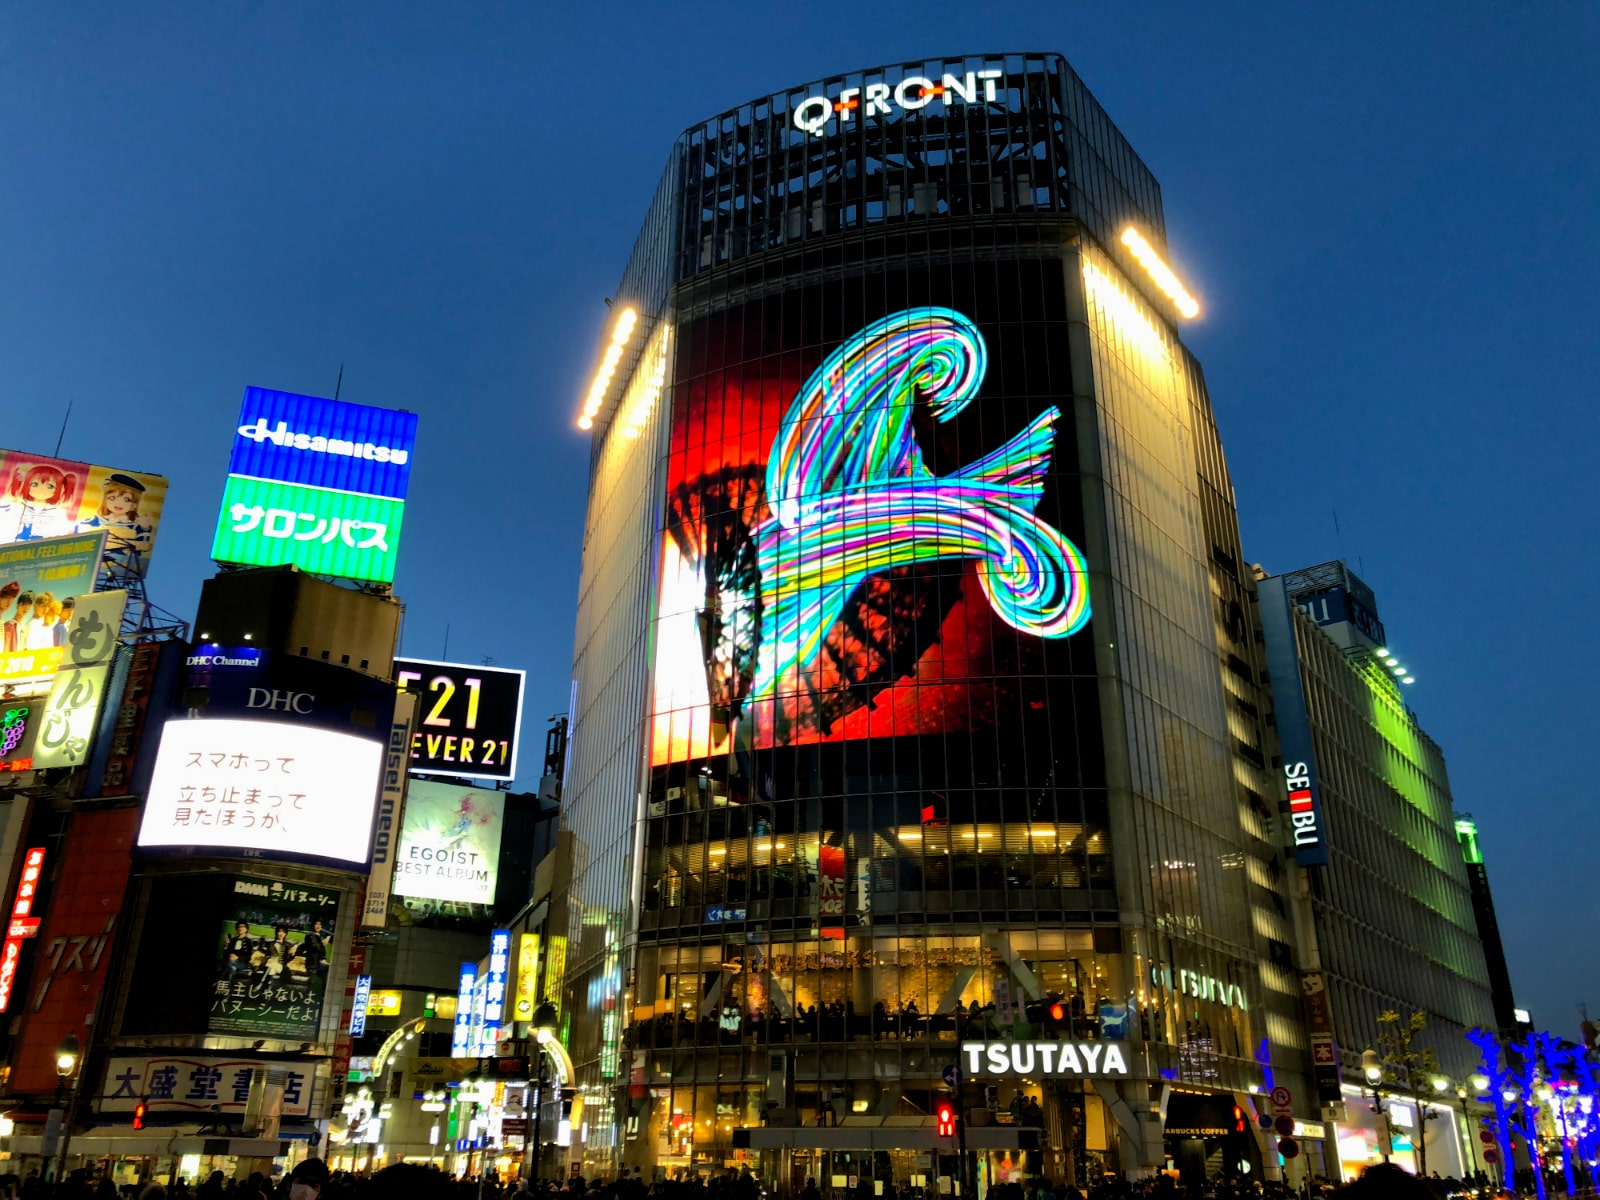 Shibuya-Q-Front-Building-by-Joshua-Meyer.jpg